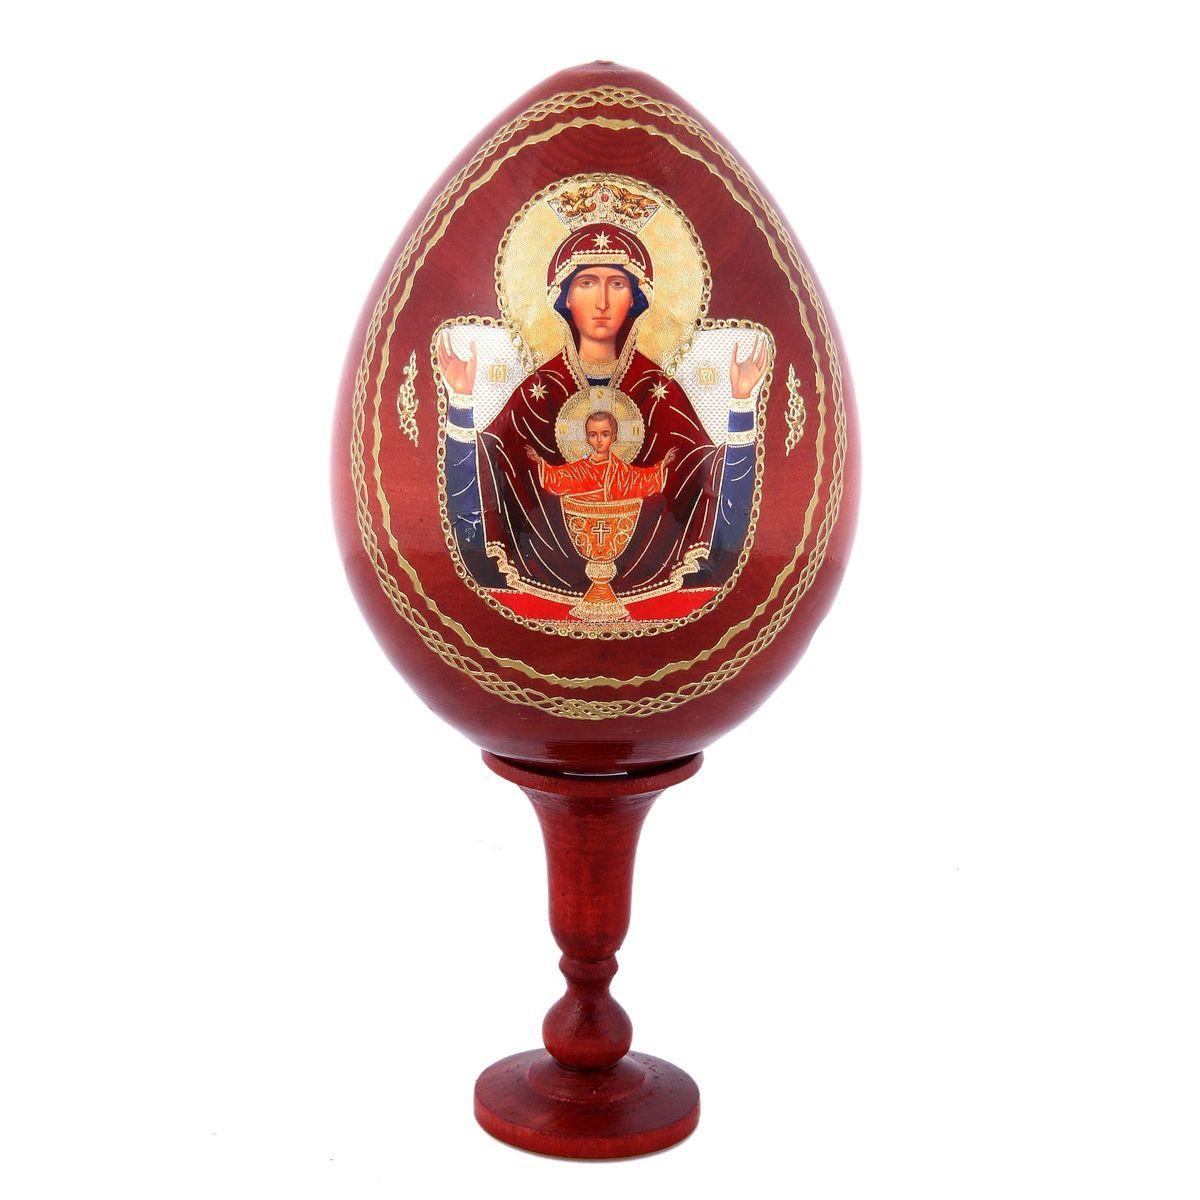 Яйцо декоративное Sima-land Неупиваемая чаша, на подставке, высота 21 см яйцо декоративное sima land семистрельная на подставке высота 12 5 см